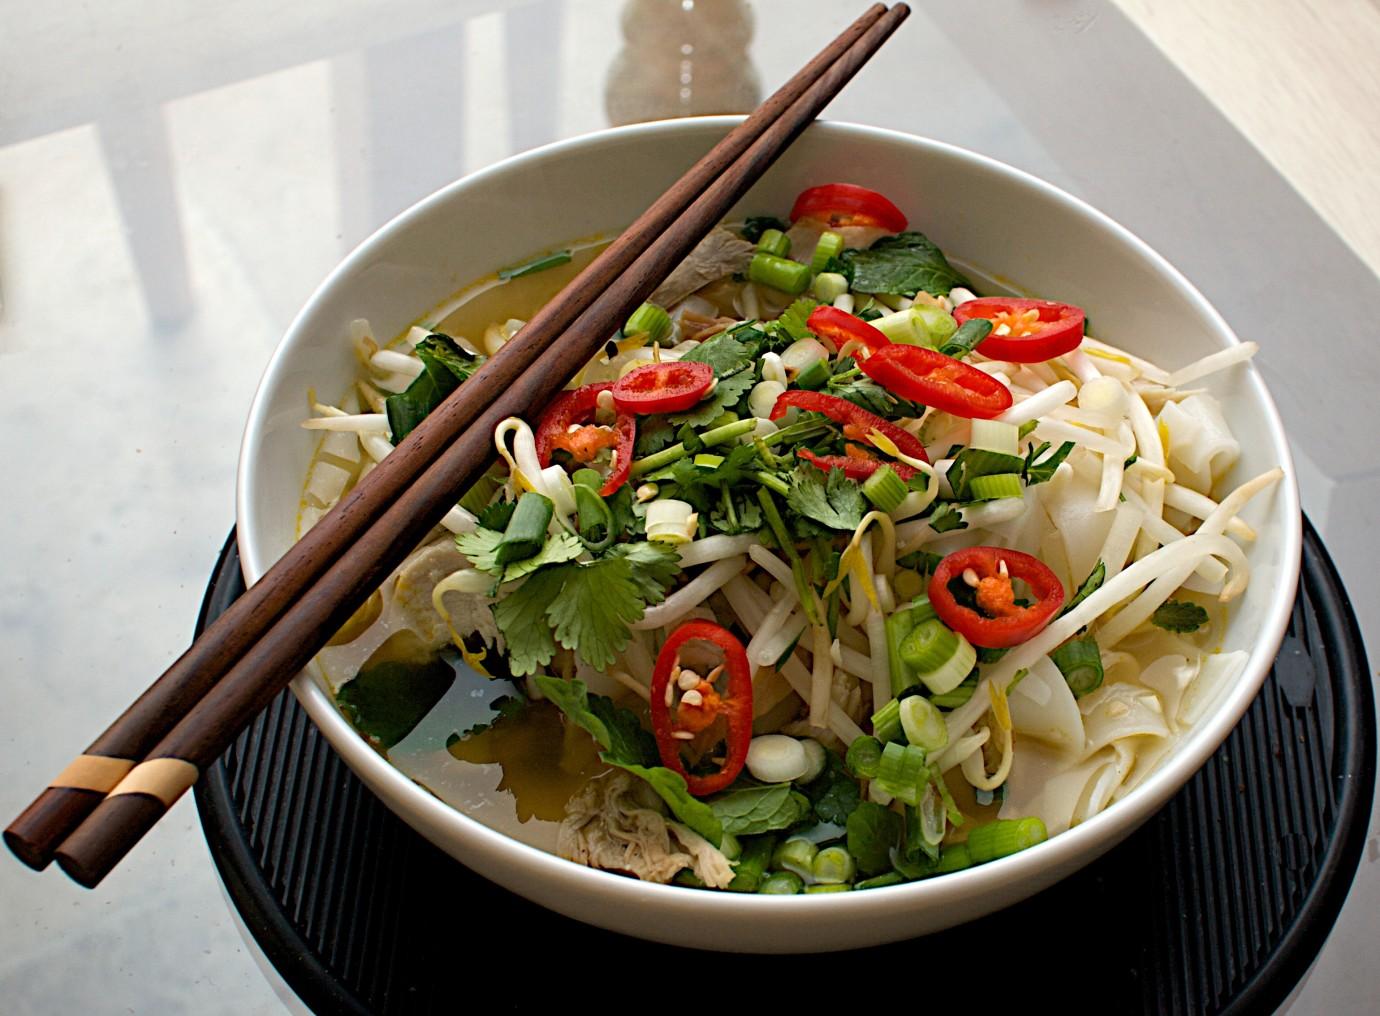 Il Gioved de La Parola di Trang la cucina vietnamita  ANAS Italia